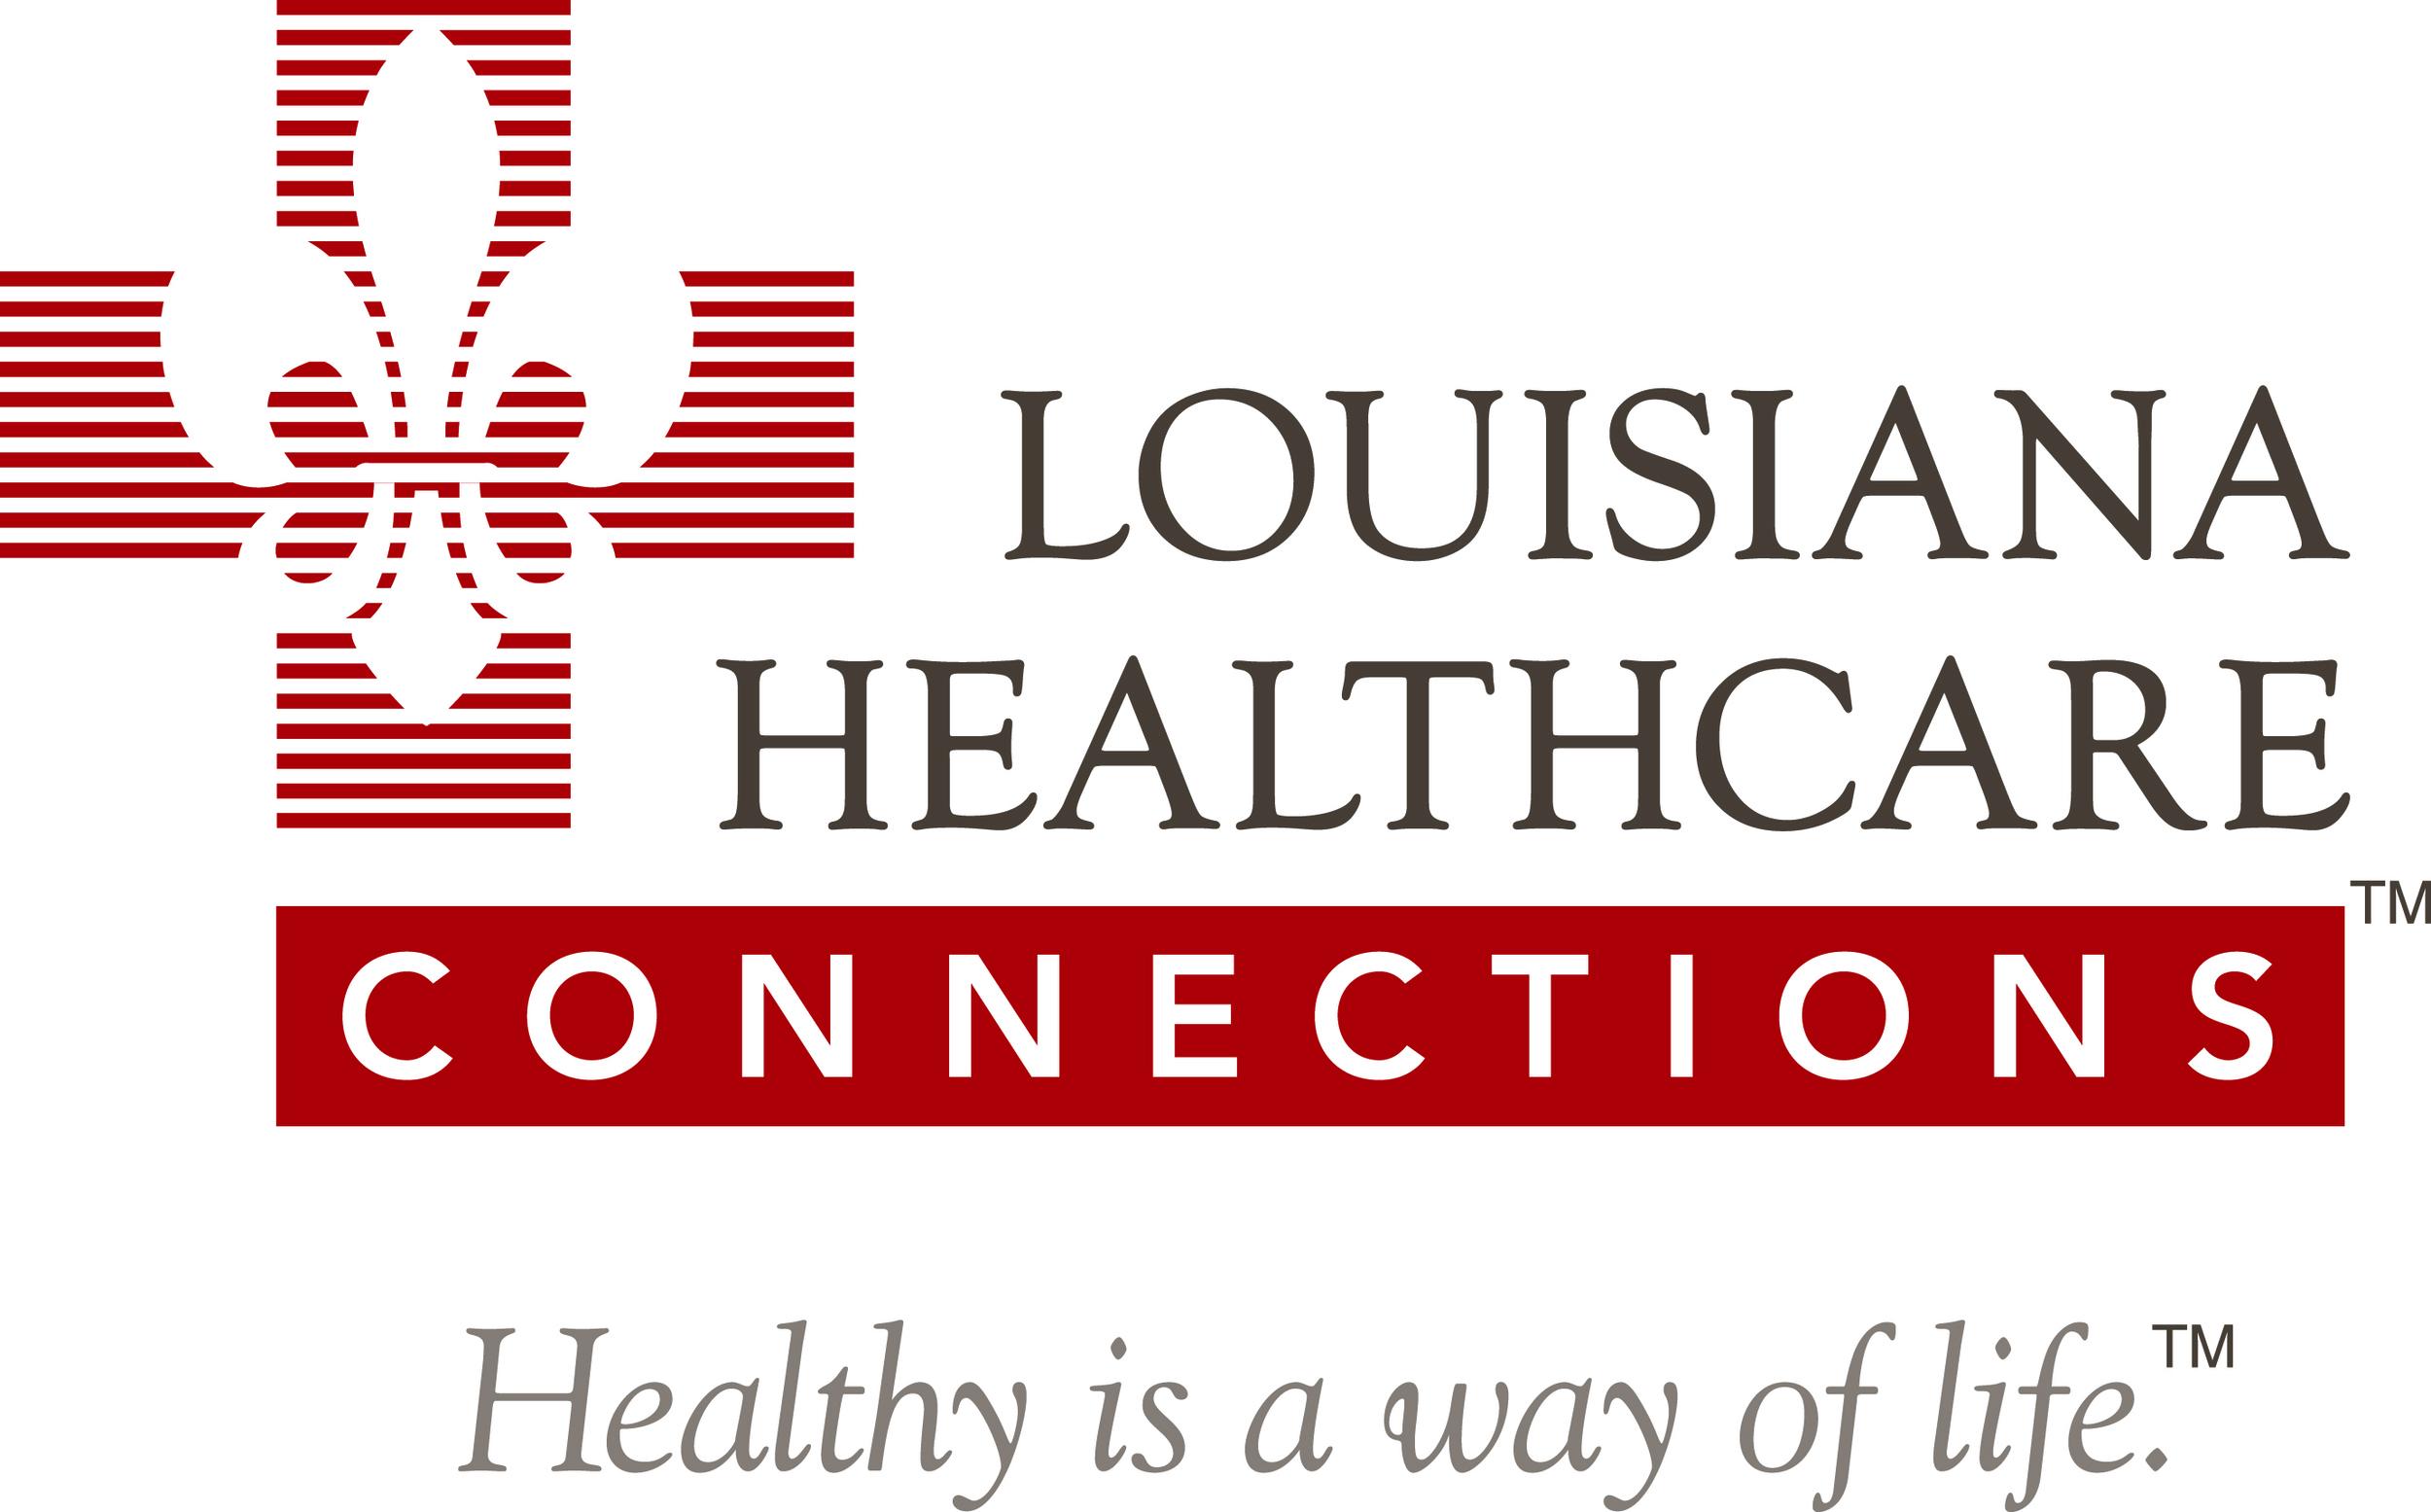 louisiana healthcare connections.jpg